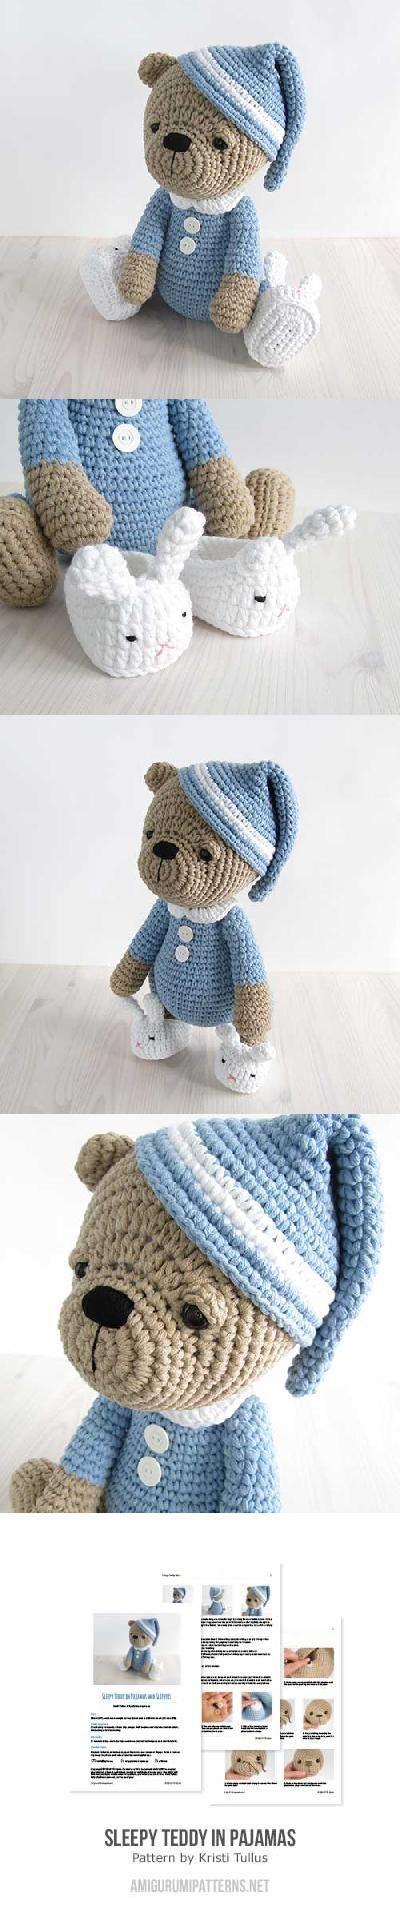 Sleepy teddy in pajamas: | Crochet stuffed animals & characters ...